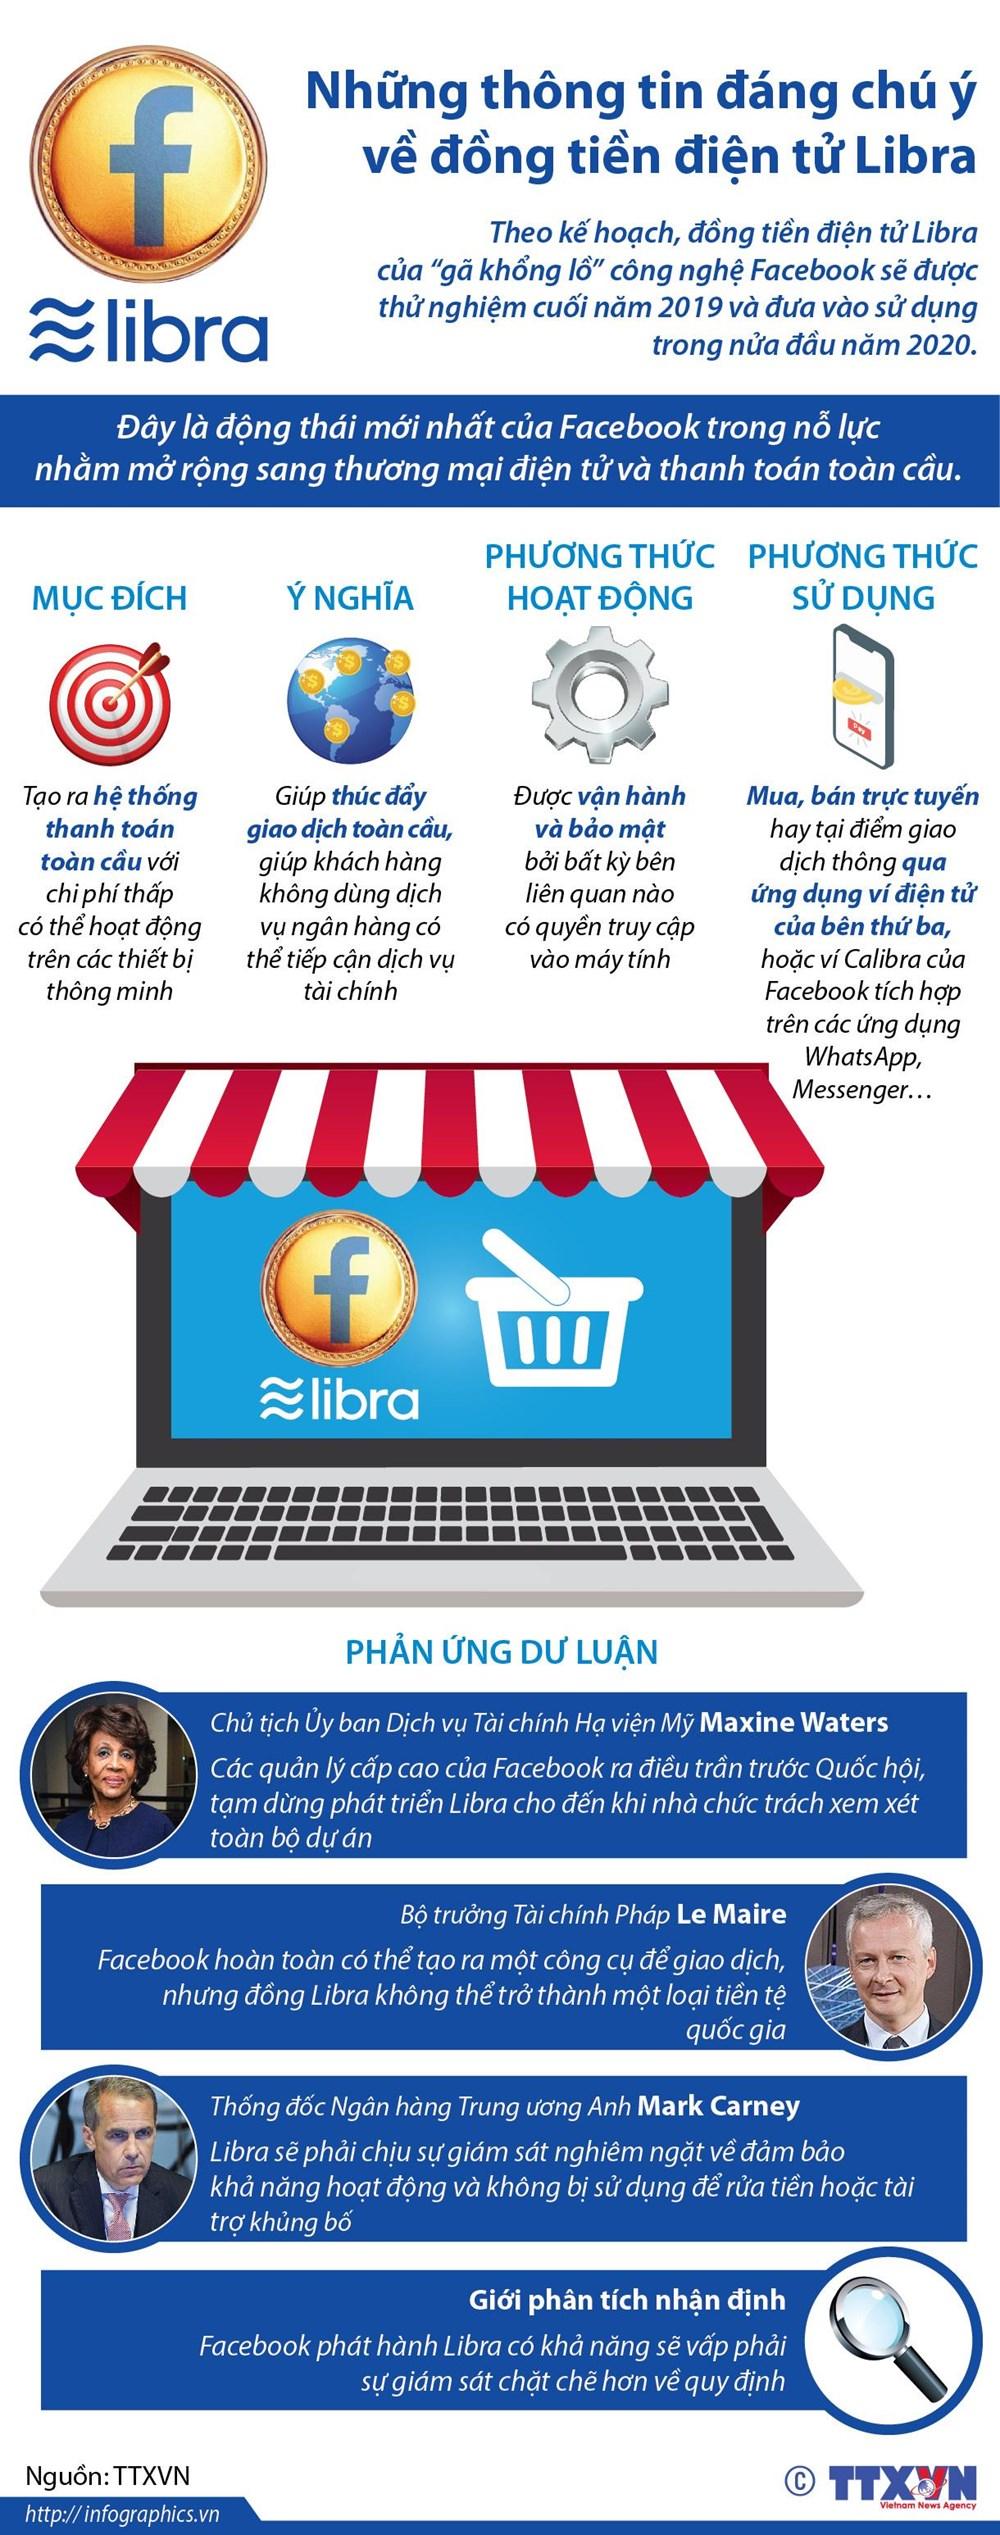 [Infographics] Nhung thong tin dang chu y ve dong tien dien tu Libra hinh anh 1